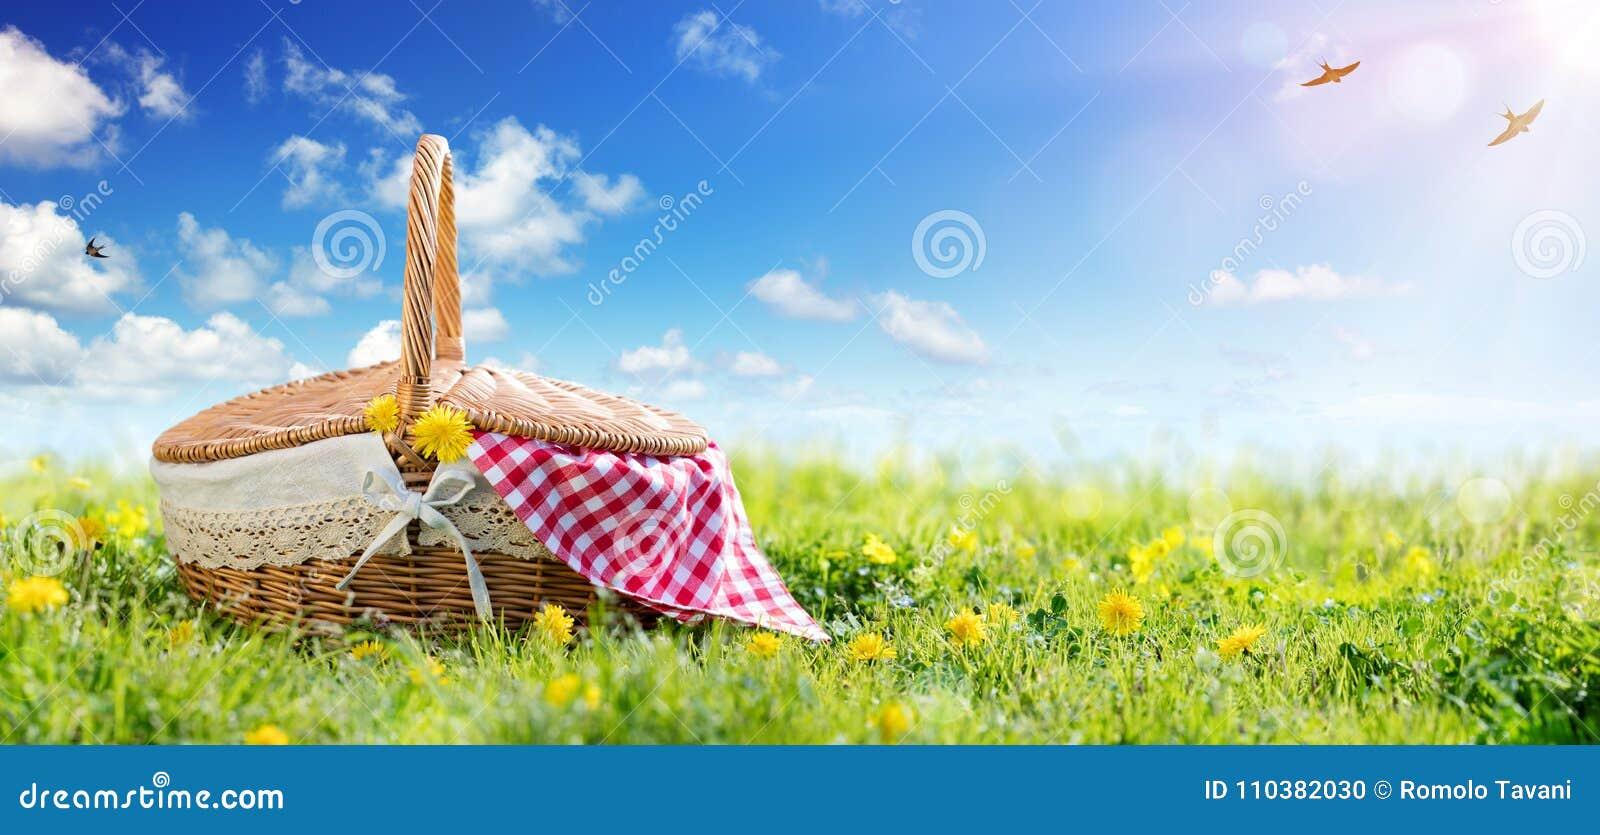 Comida campestre - cesta en prado